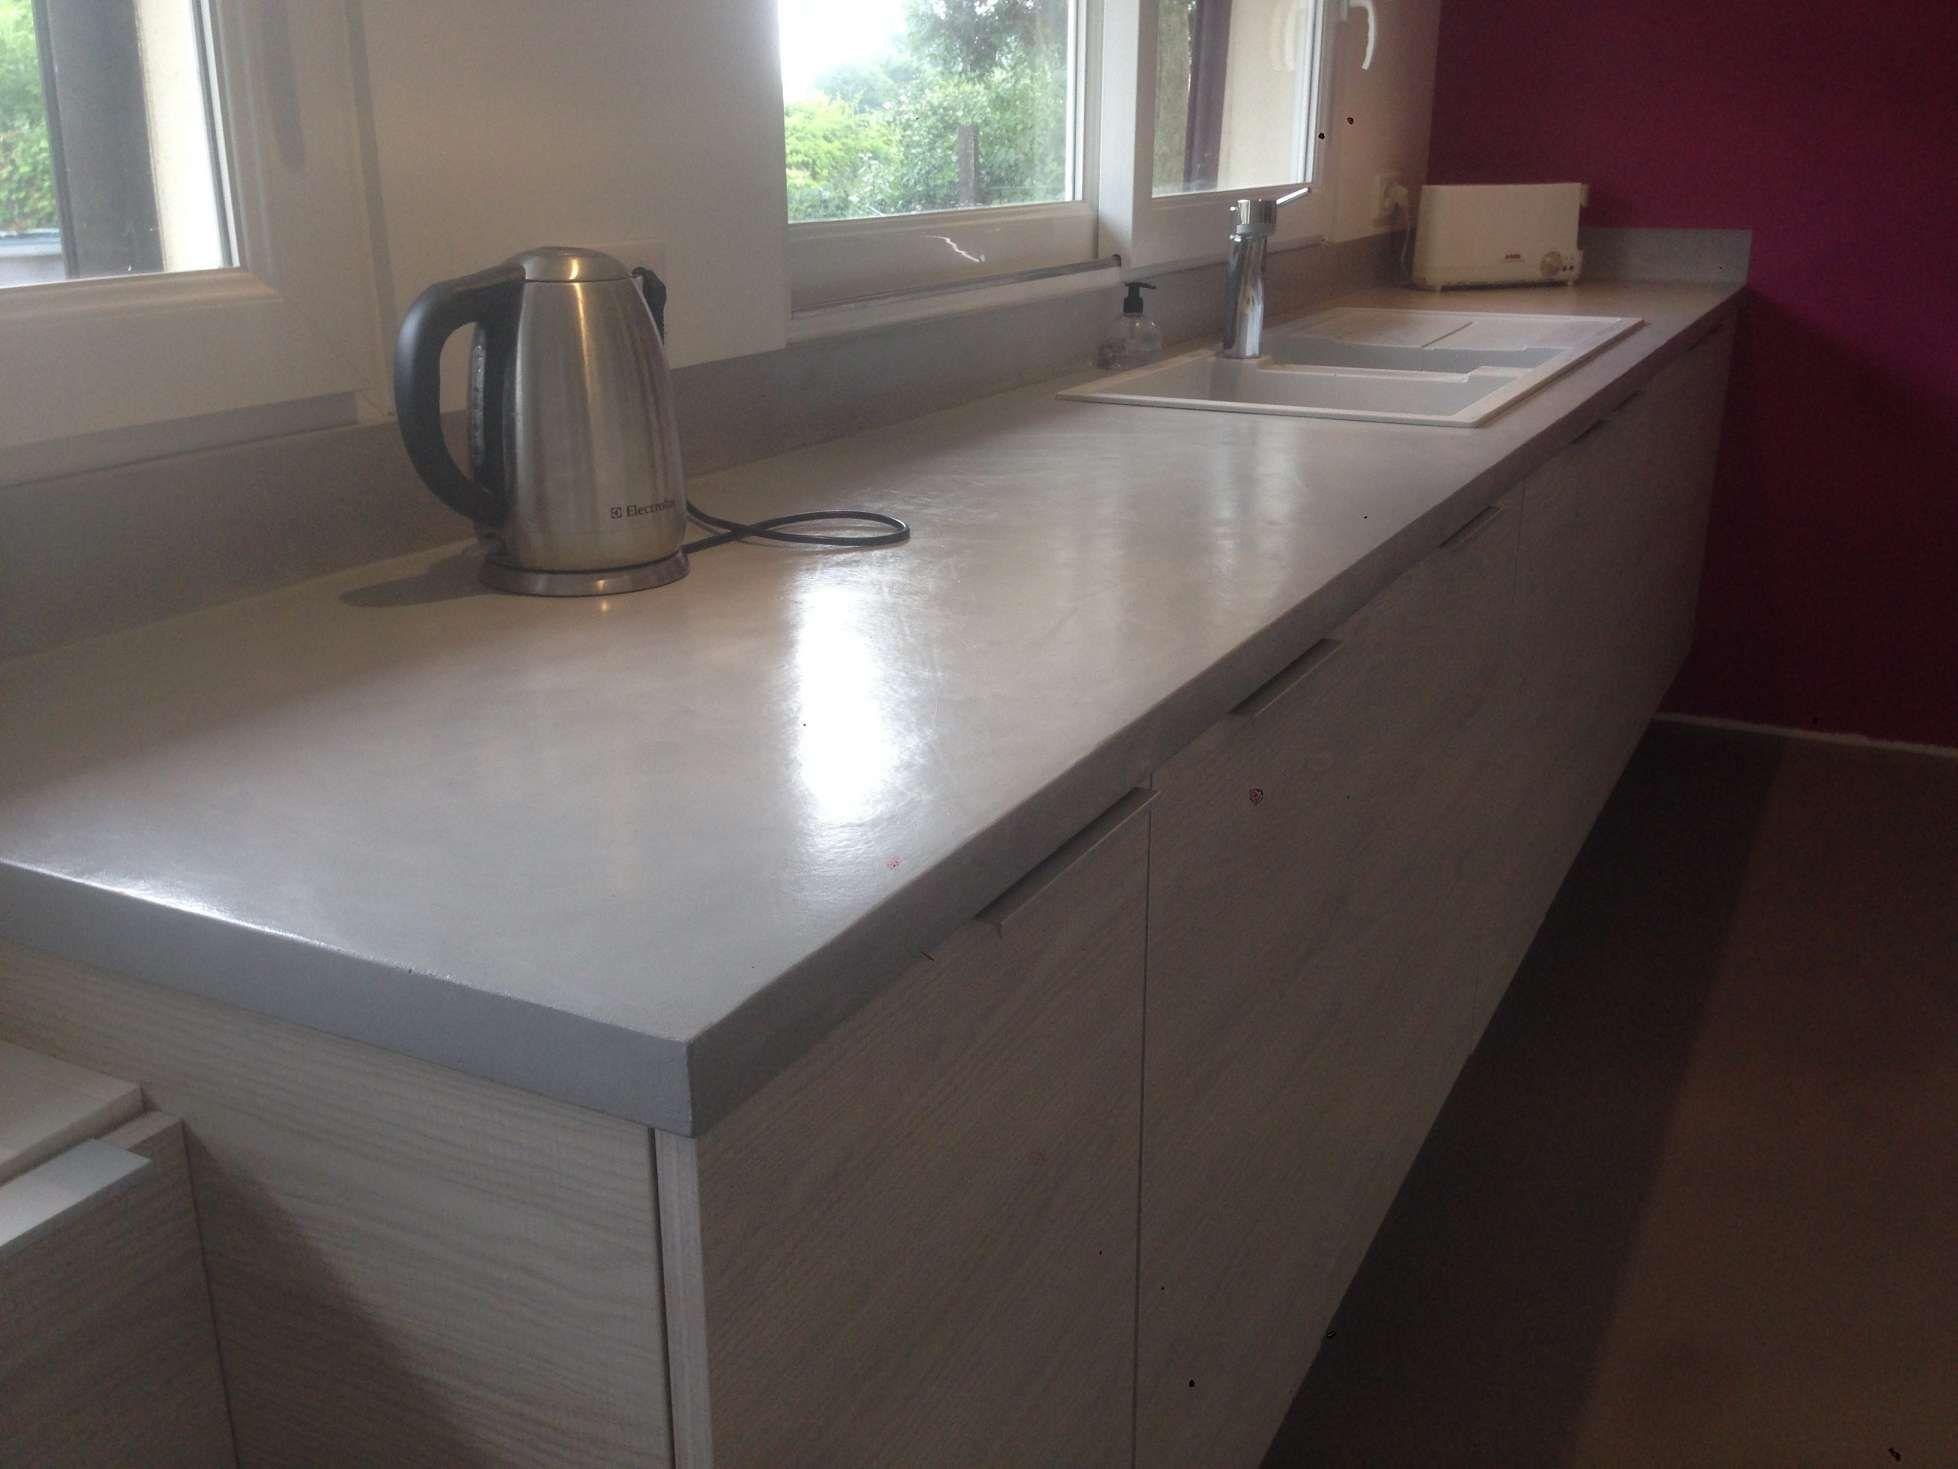 16 Beton Cire Cuisine Plan Travail Kitchen Home Home Decor